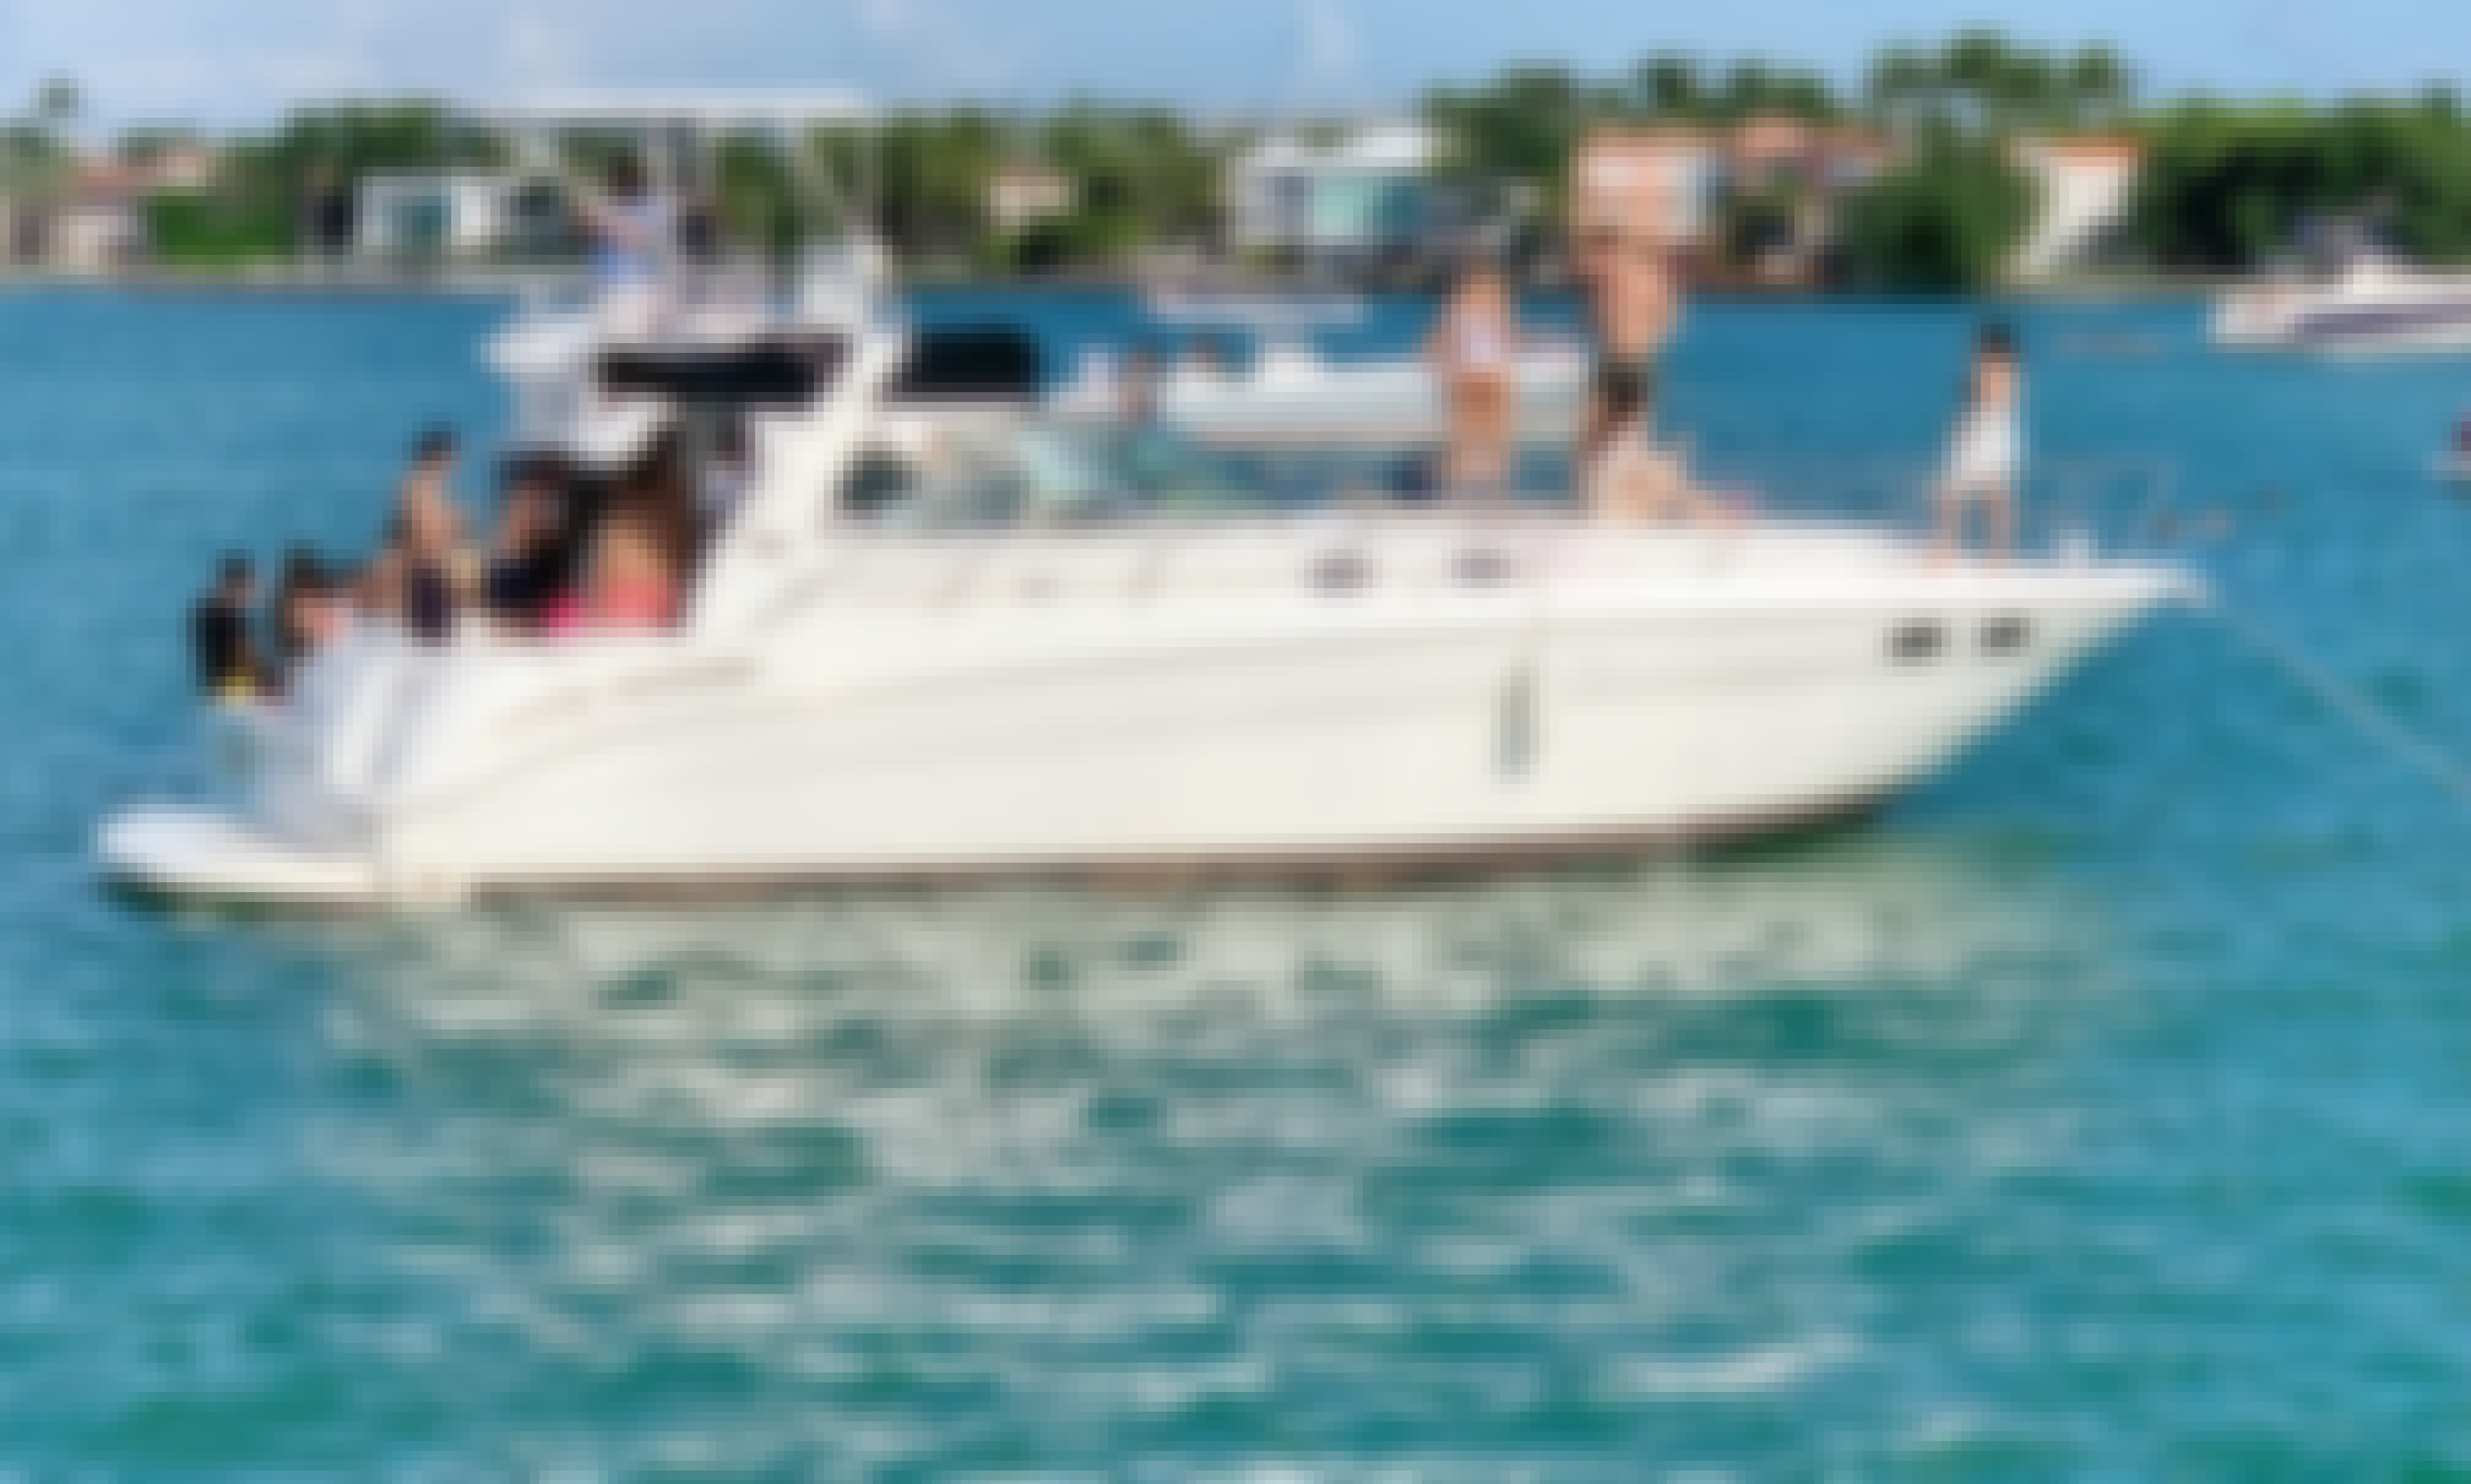 41' Sea Ray Motor Yacht at Brickell Boat Charters in Miami, Florida